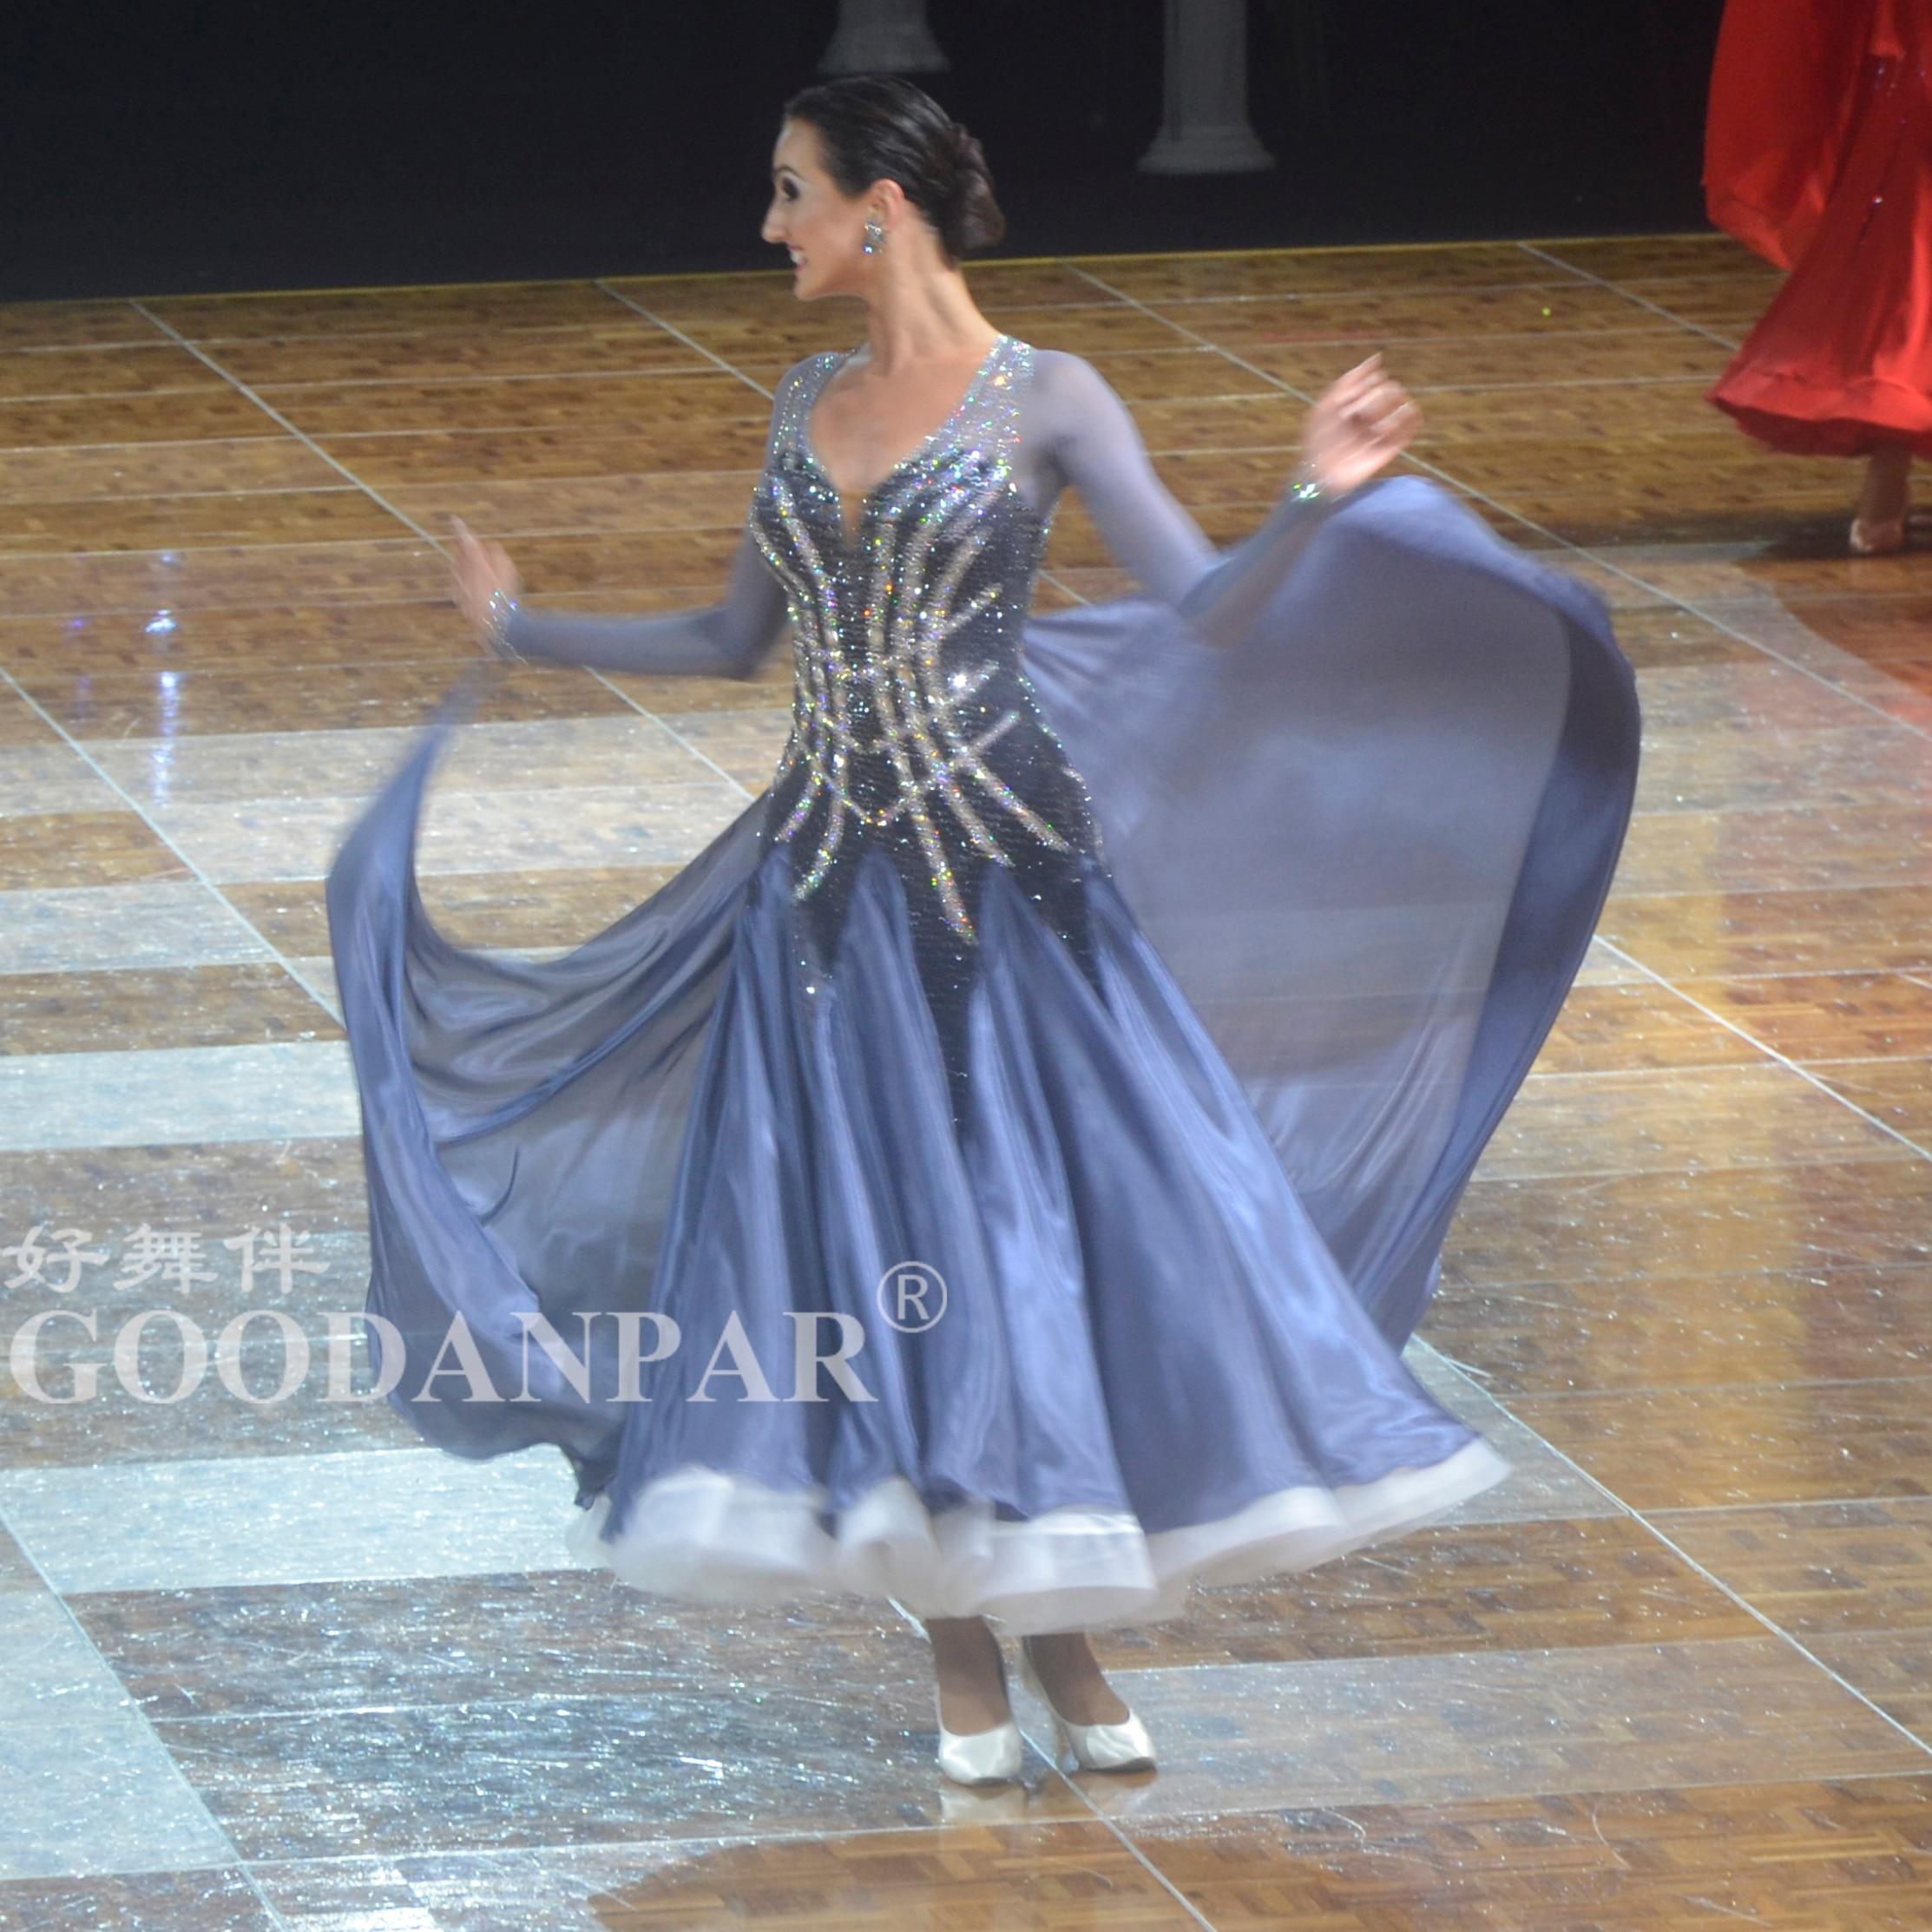 Ballroom Dance Competition Dresses Ballroom Dance Dress Ballroom Standard Dance Dresses Social Dance Dress Modern Dance Dress